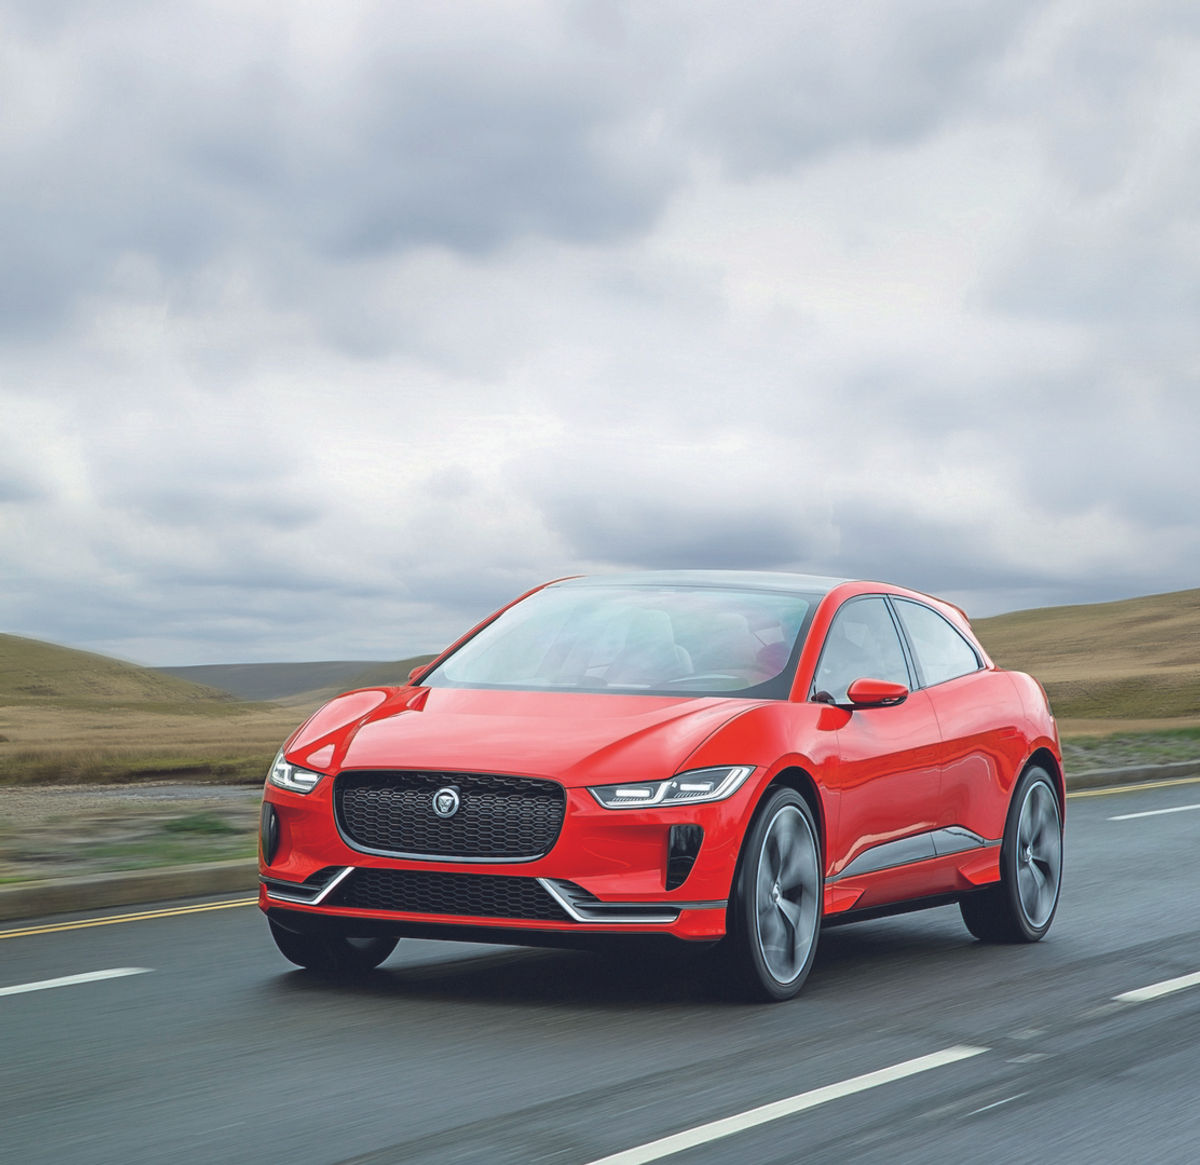 The New Jaguar: Jaguar I-Pace Concept (2018) International First Drive